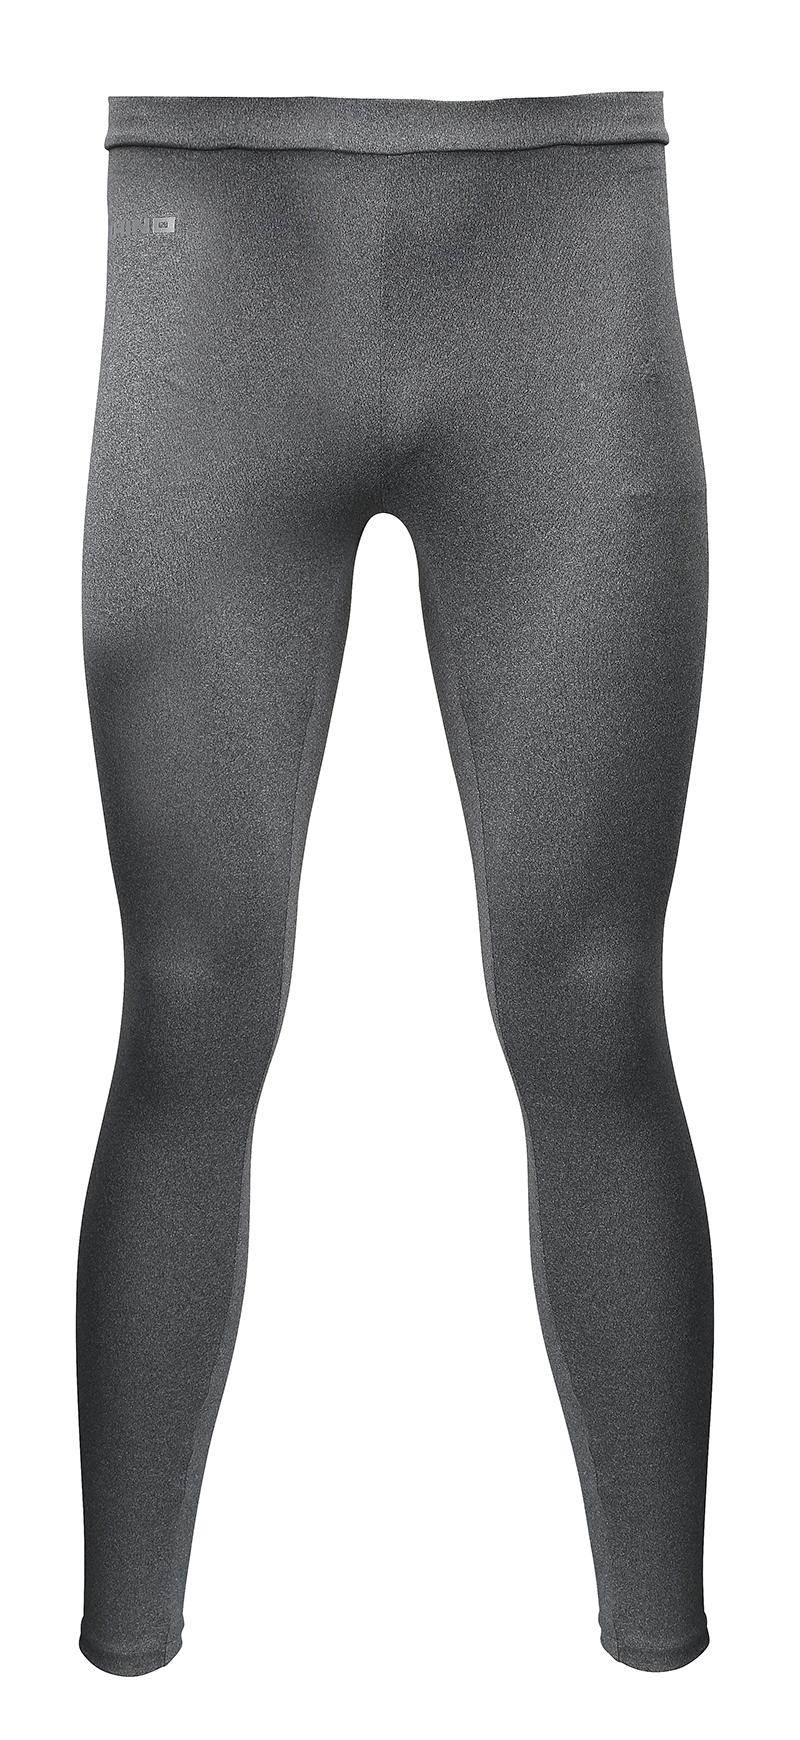 Rhino-Junior-Capa-Base-Leggings-infantil-deporte-actividad-Pantalones-ATLETISMO